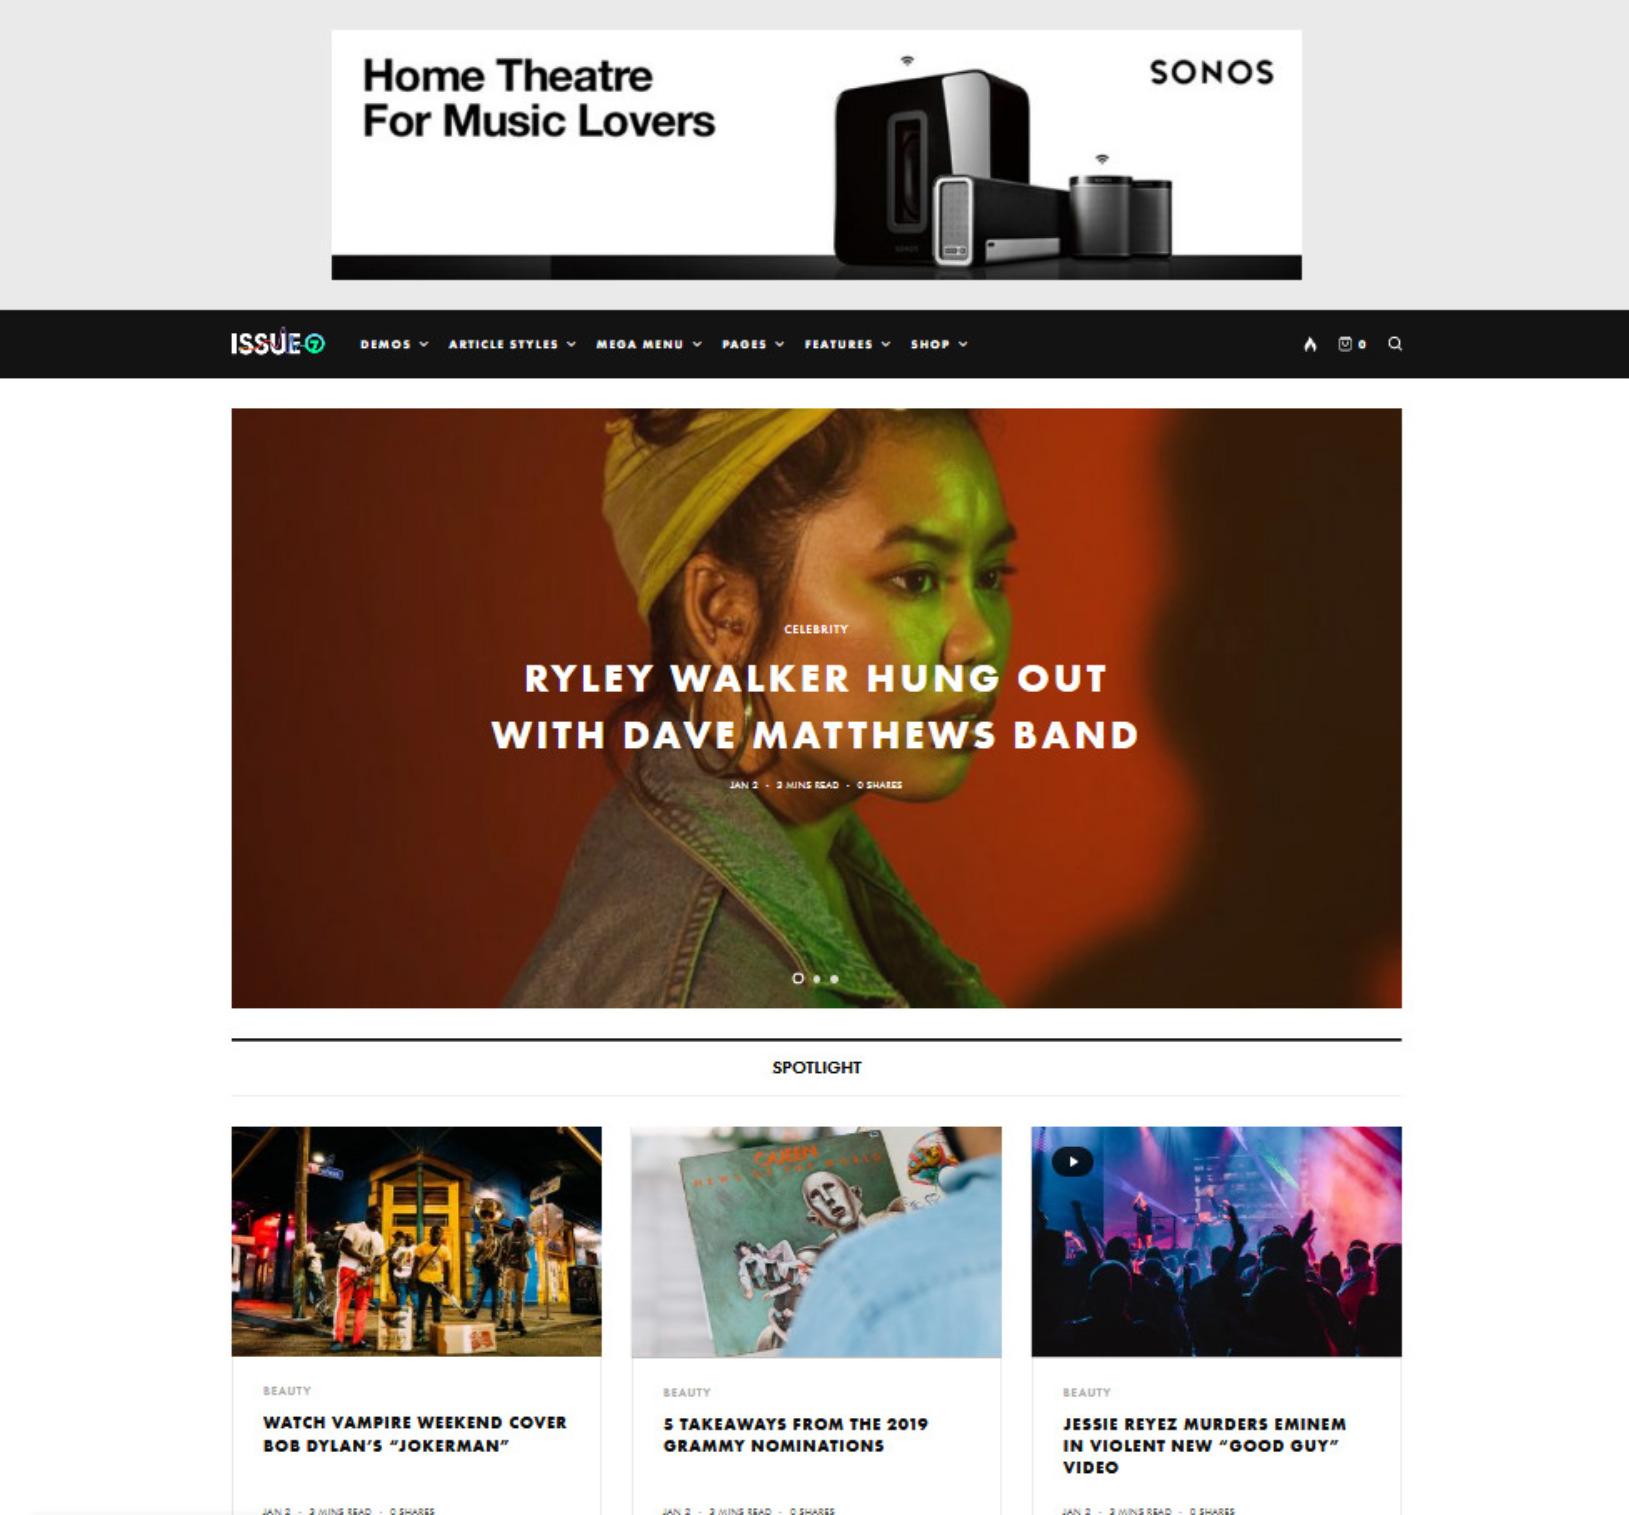 The Issue WordPress Video Blog Theme